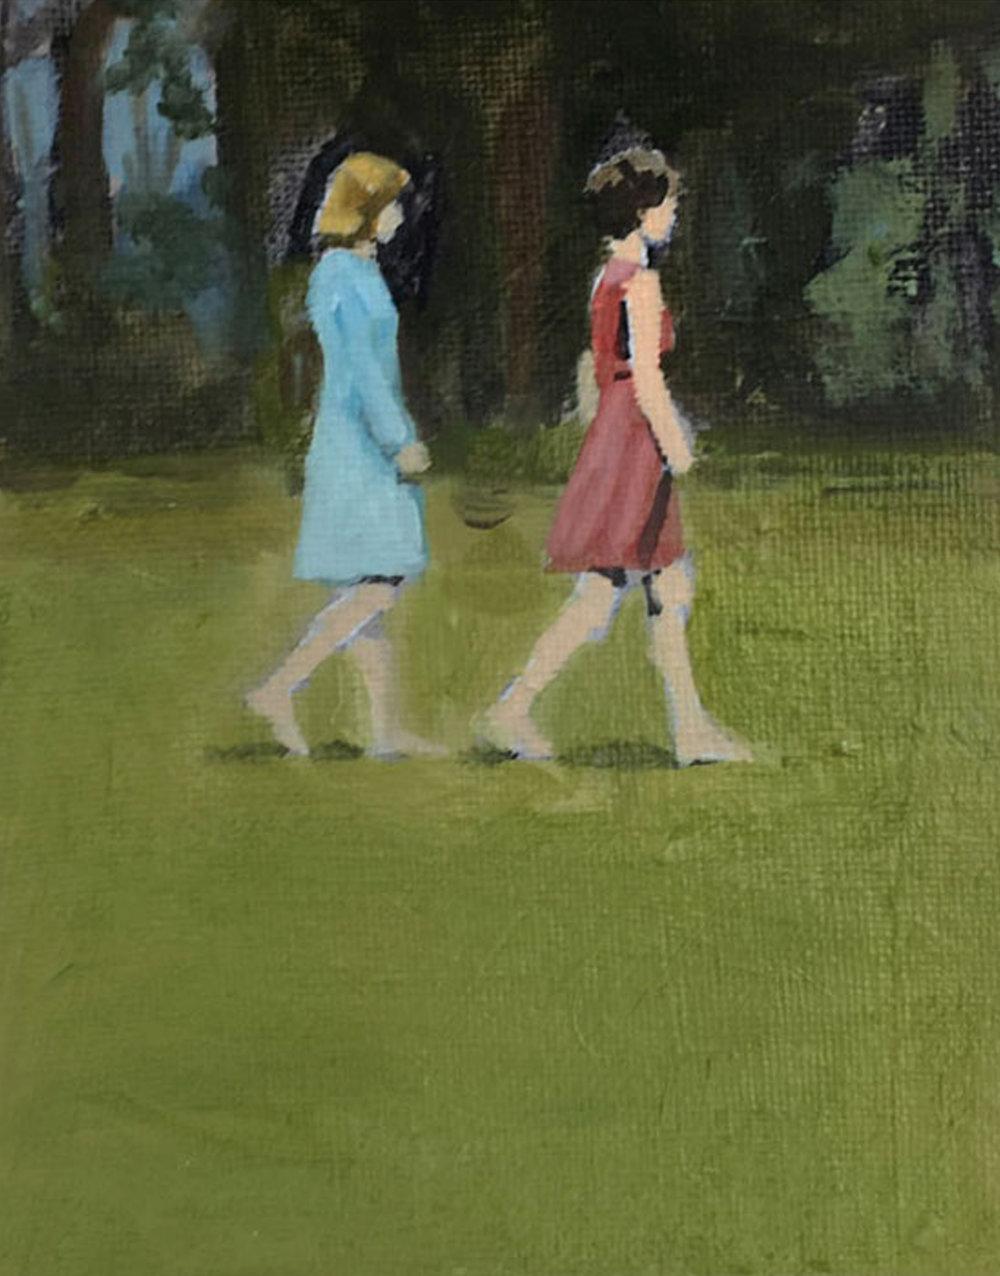 Artist: David Storey  Title: Two Women Walking  Size: 10 x 13 cm  Medium: Egg tempera and oil on panel  SOLD